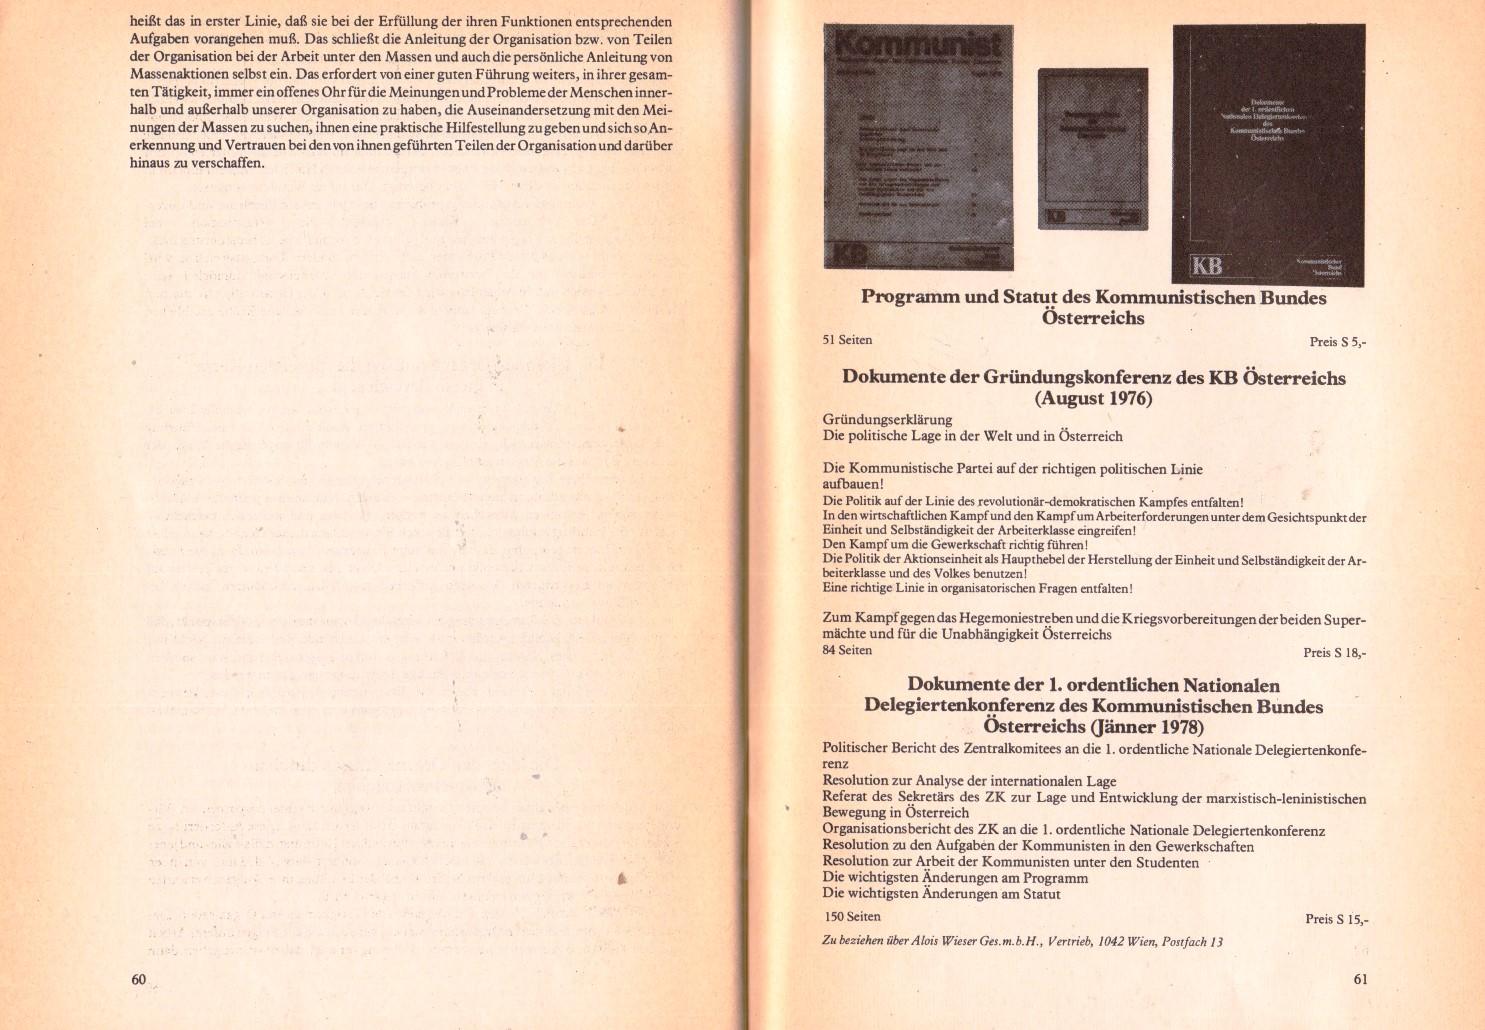 KBOe_1979_Doku_ZK_Plenum_04_32